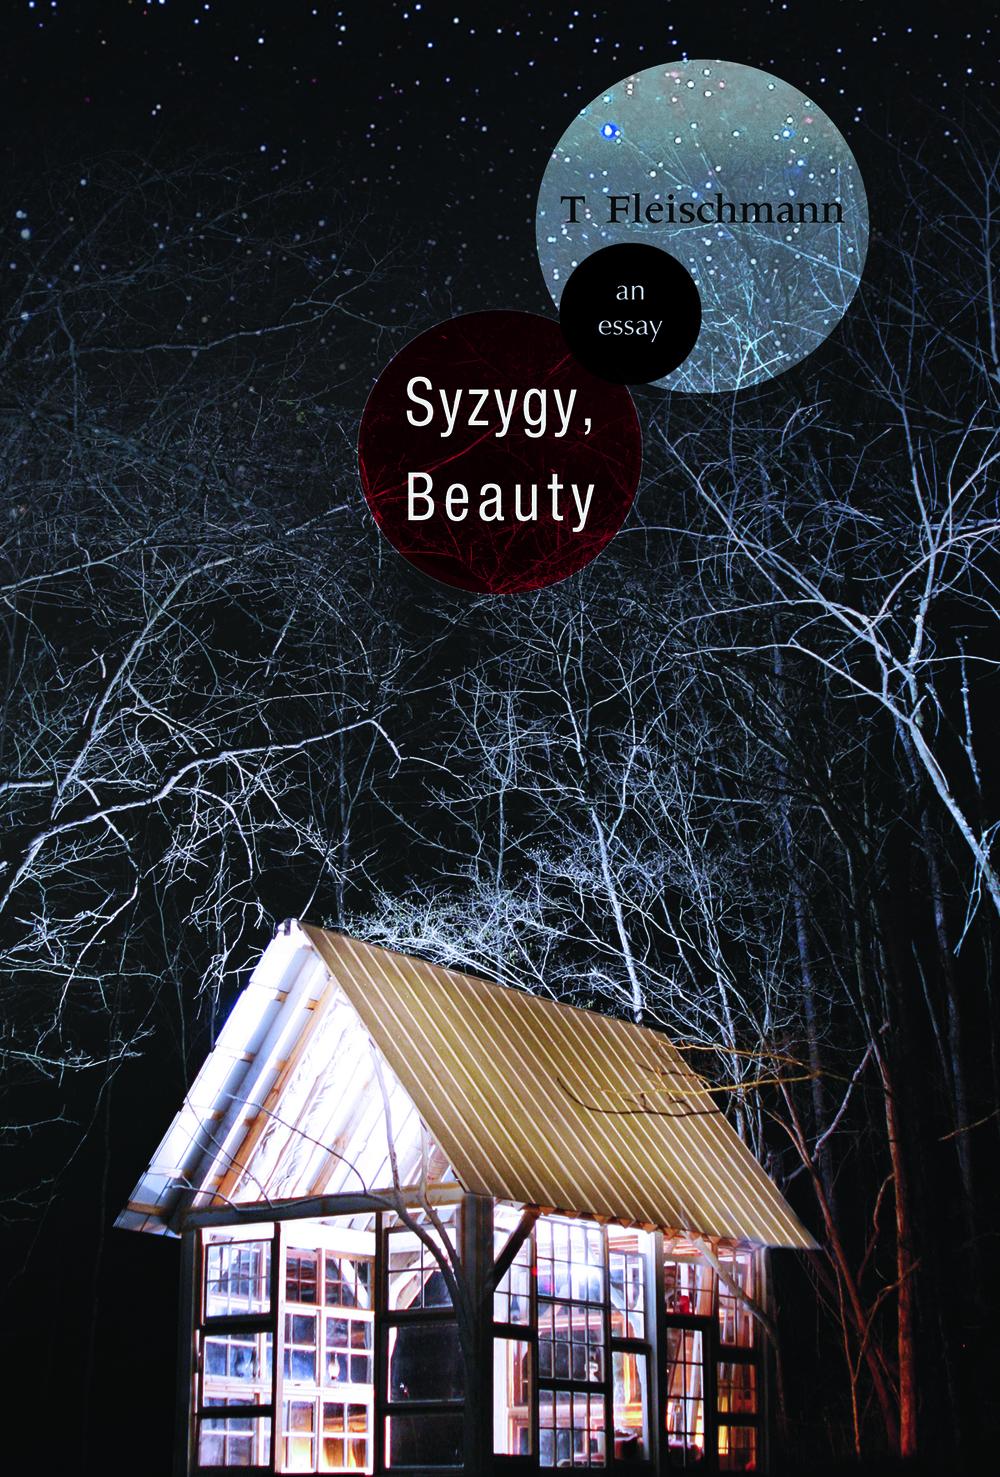 syzygy beauty an essay t fleischmann sarabande books